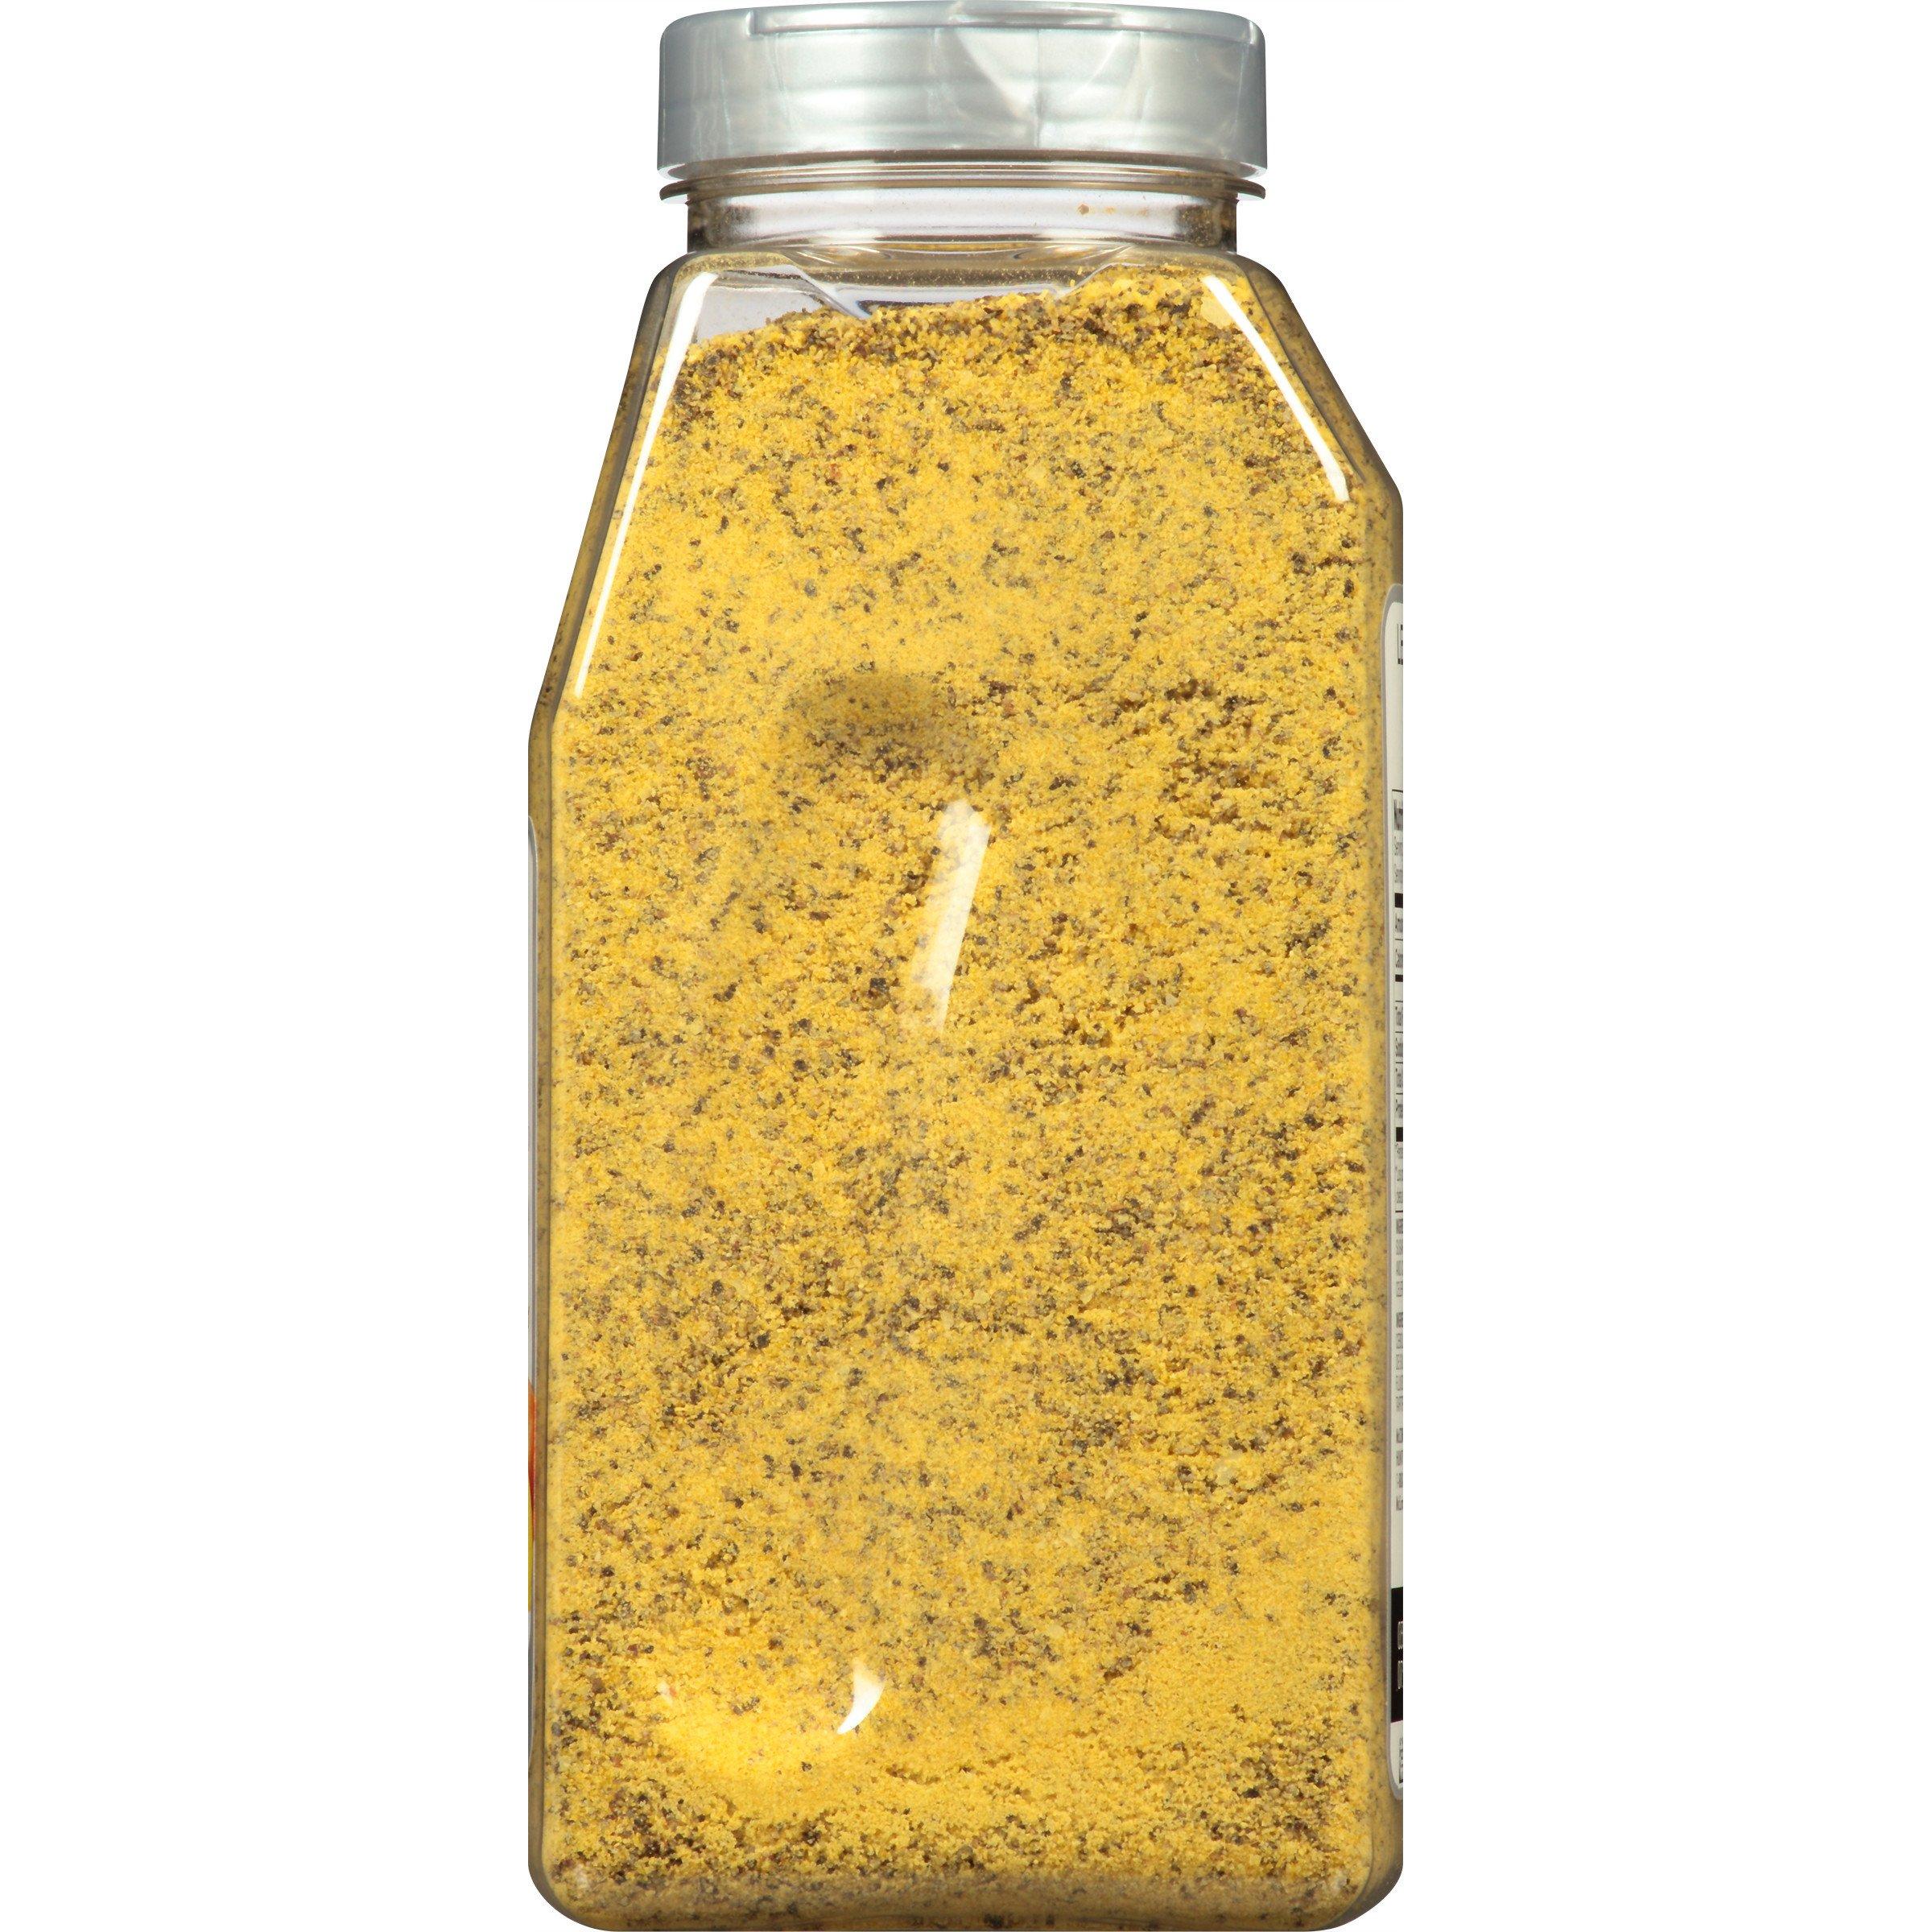 McCormick Culinary Lemon & Pepper Seasoning Salt, 28 oz by McCormick (Image #5)